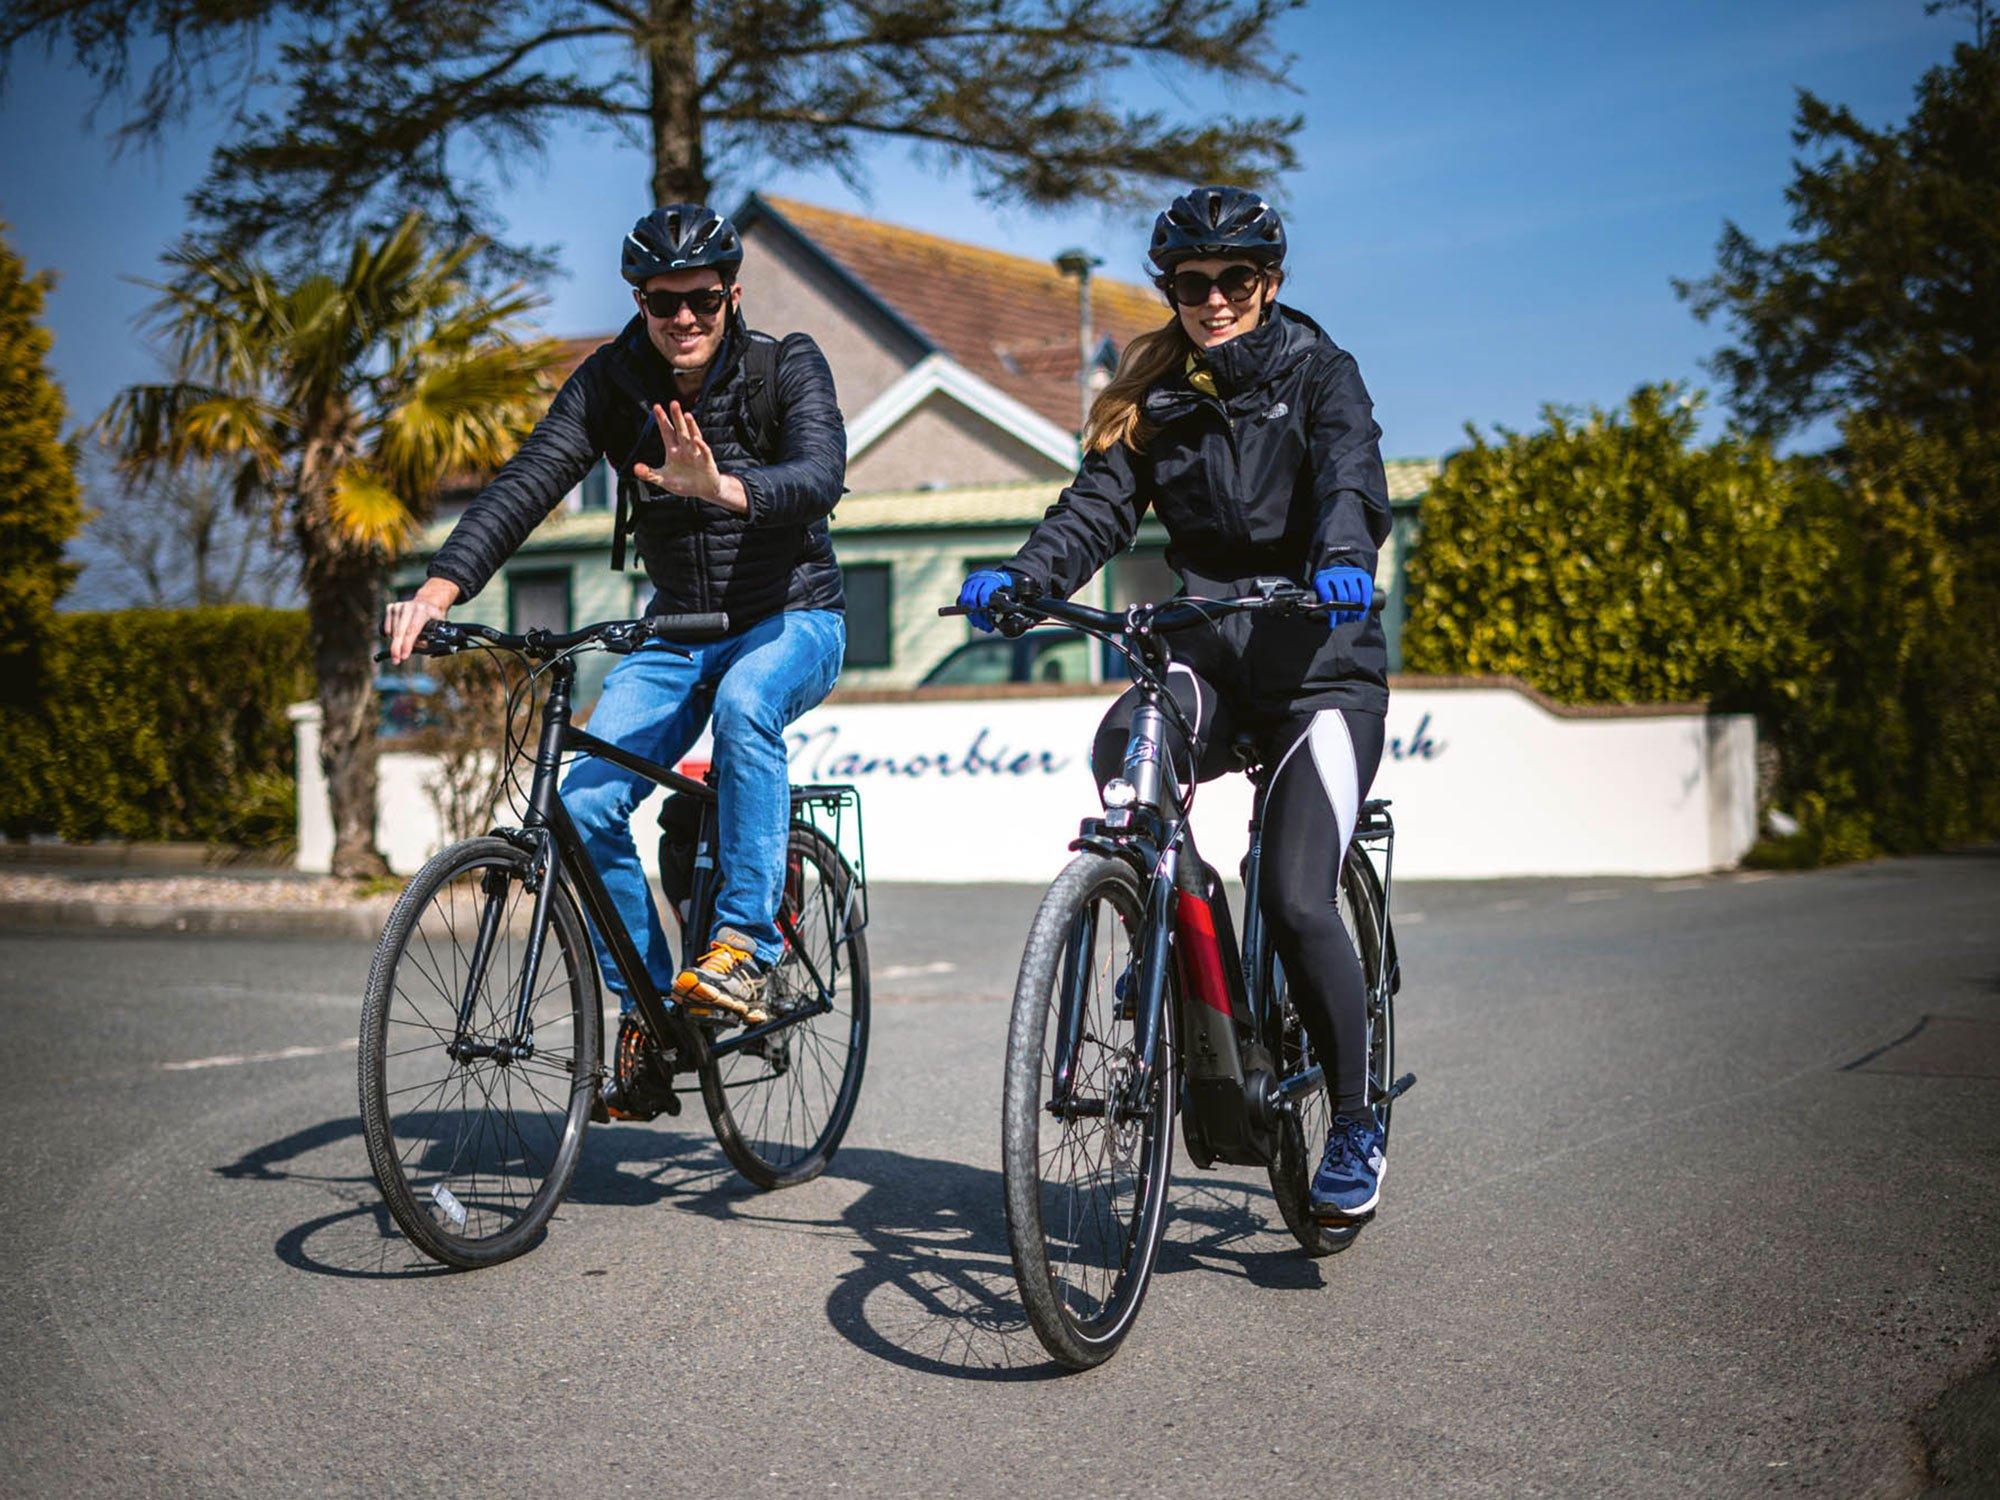 Pembrokeshire Bike Hire and Electric Bike Hire